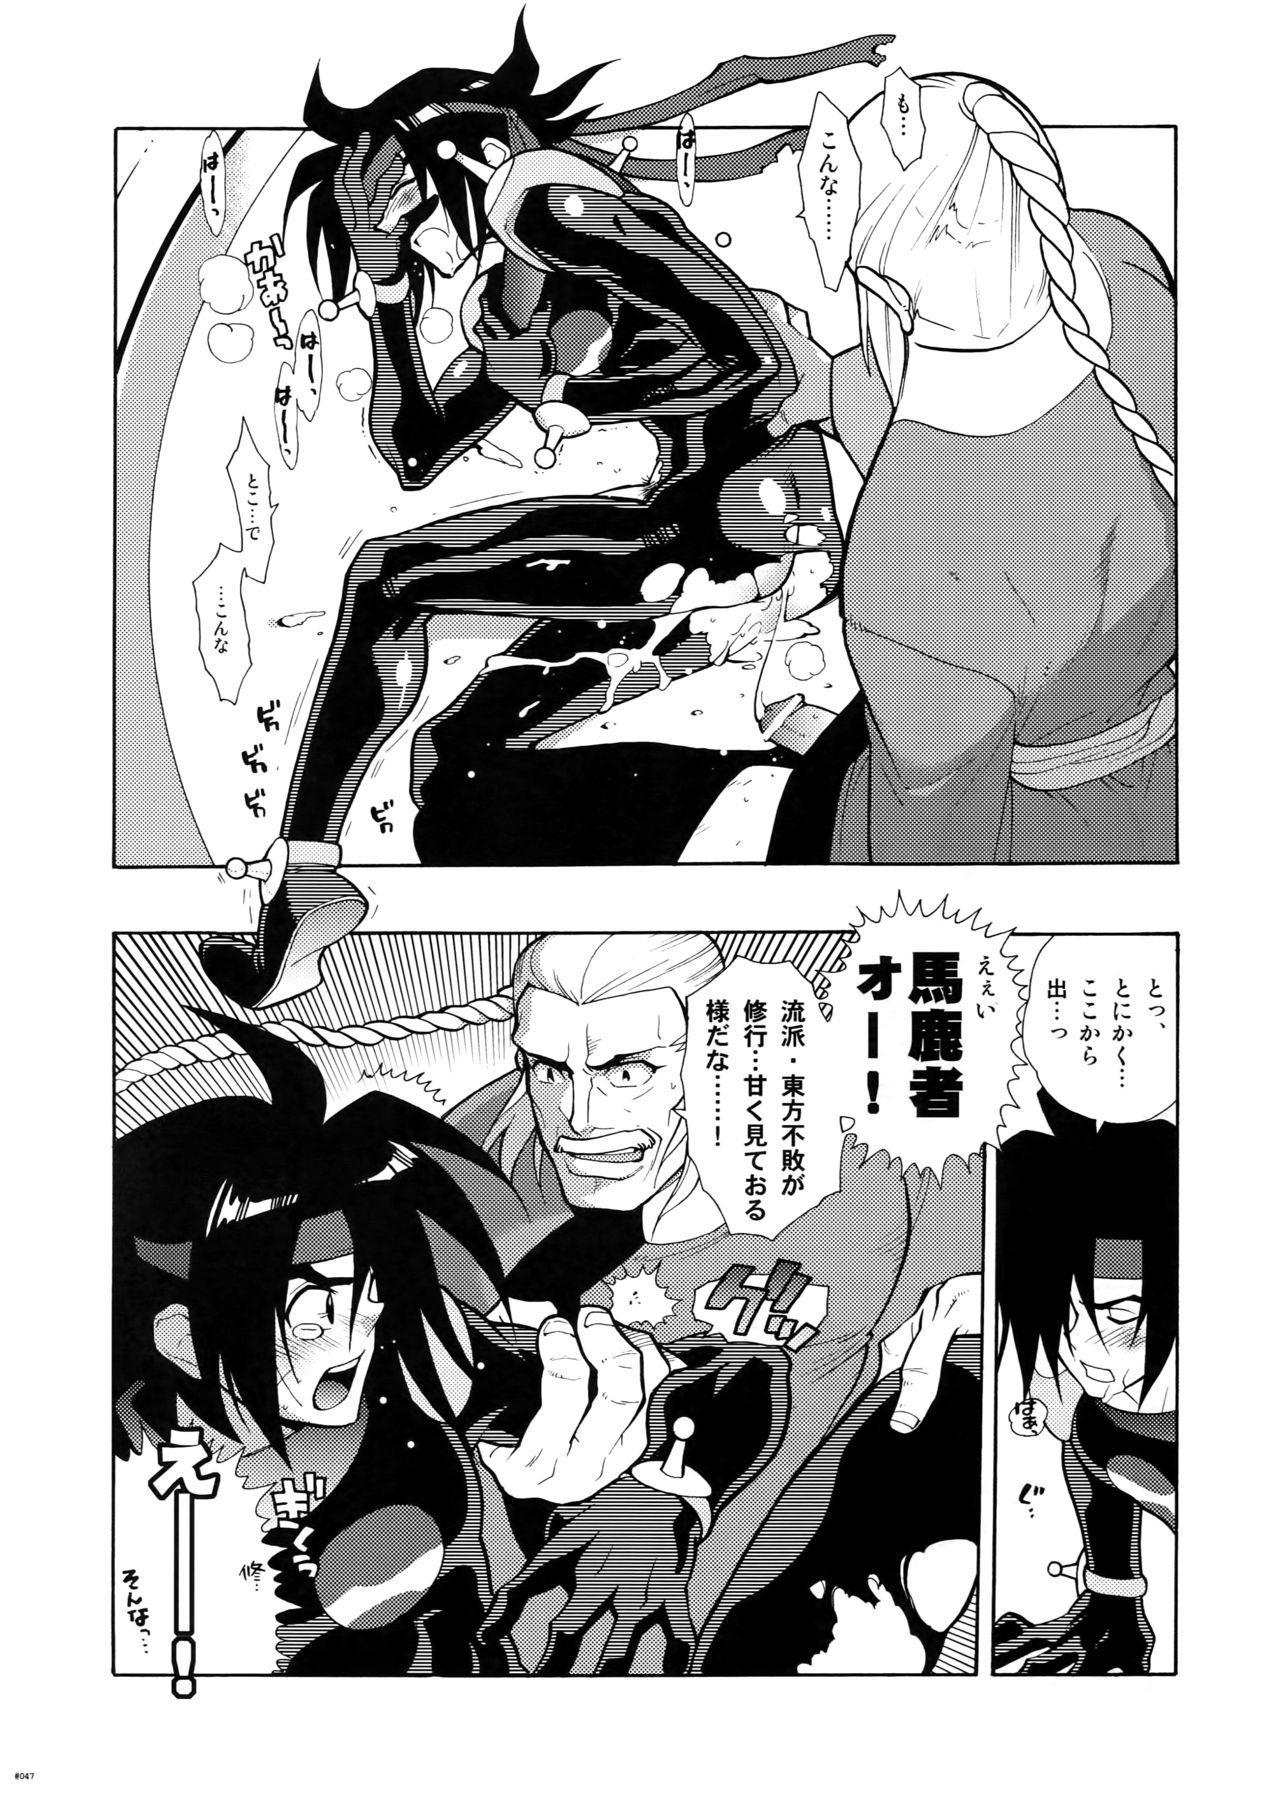 [Article 60 of Criminal Code (Shuhan)] G-gan Josei-Muke Sairoku-Shuu (G Gundam) 46